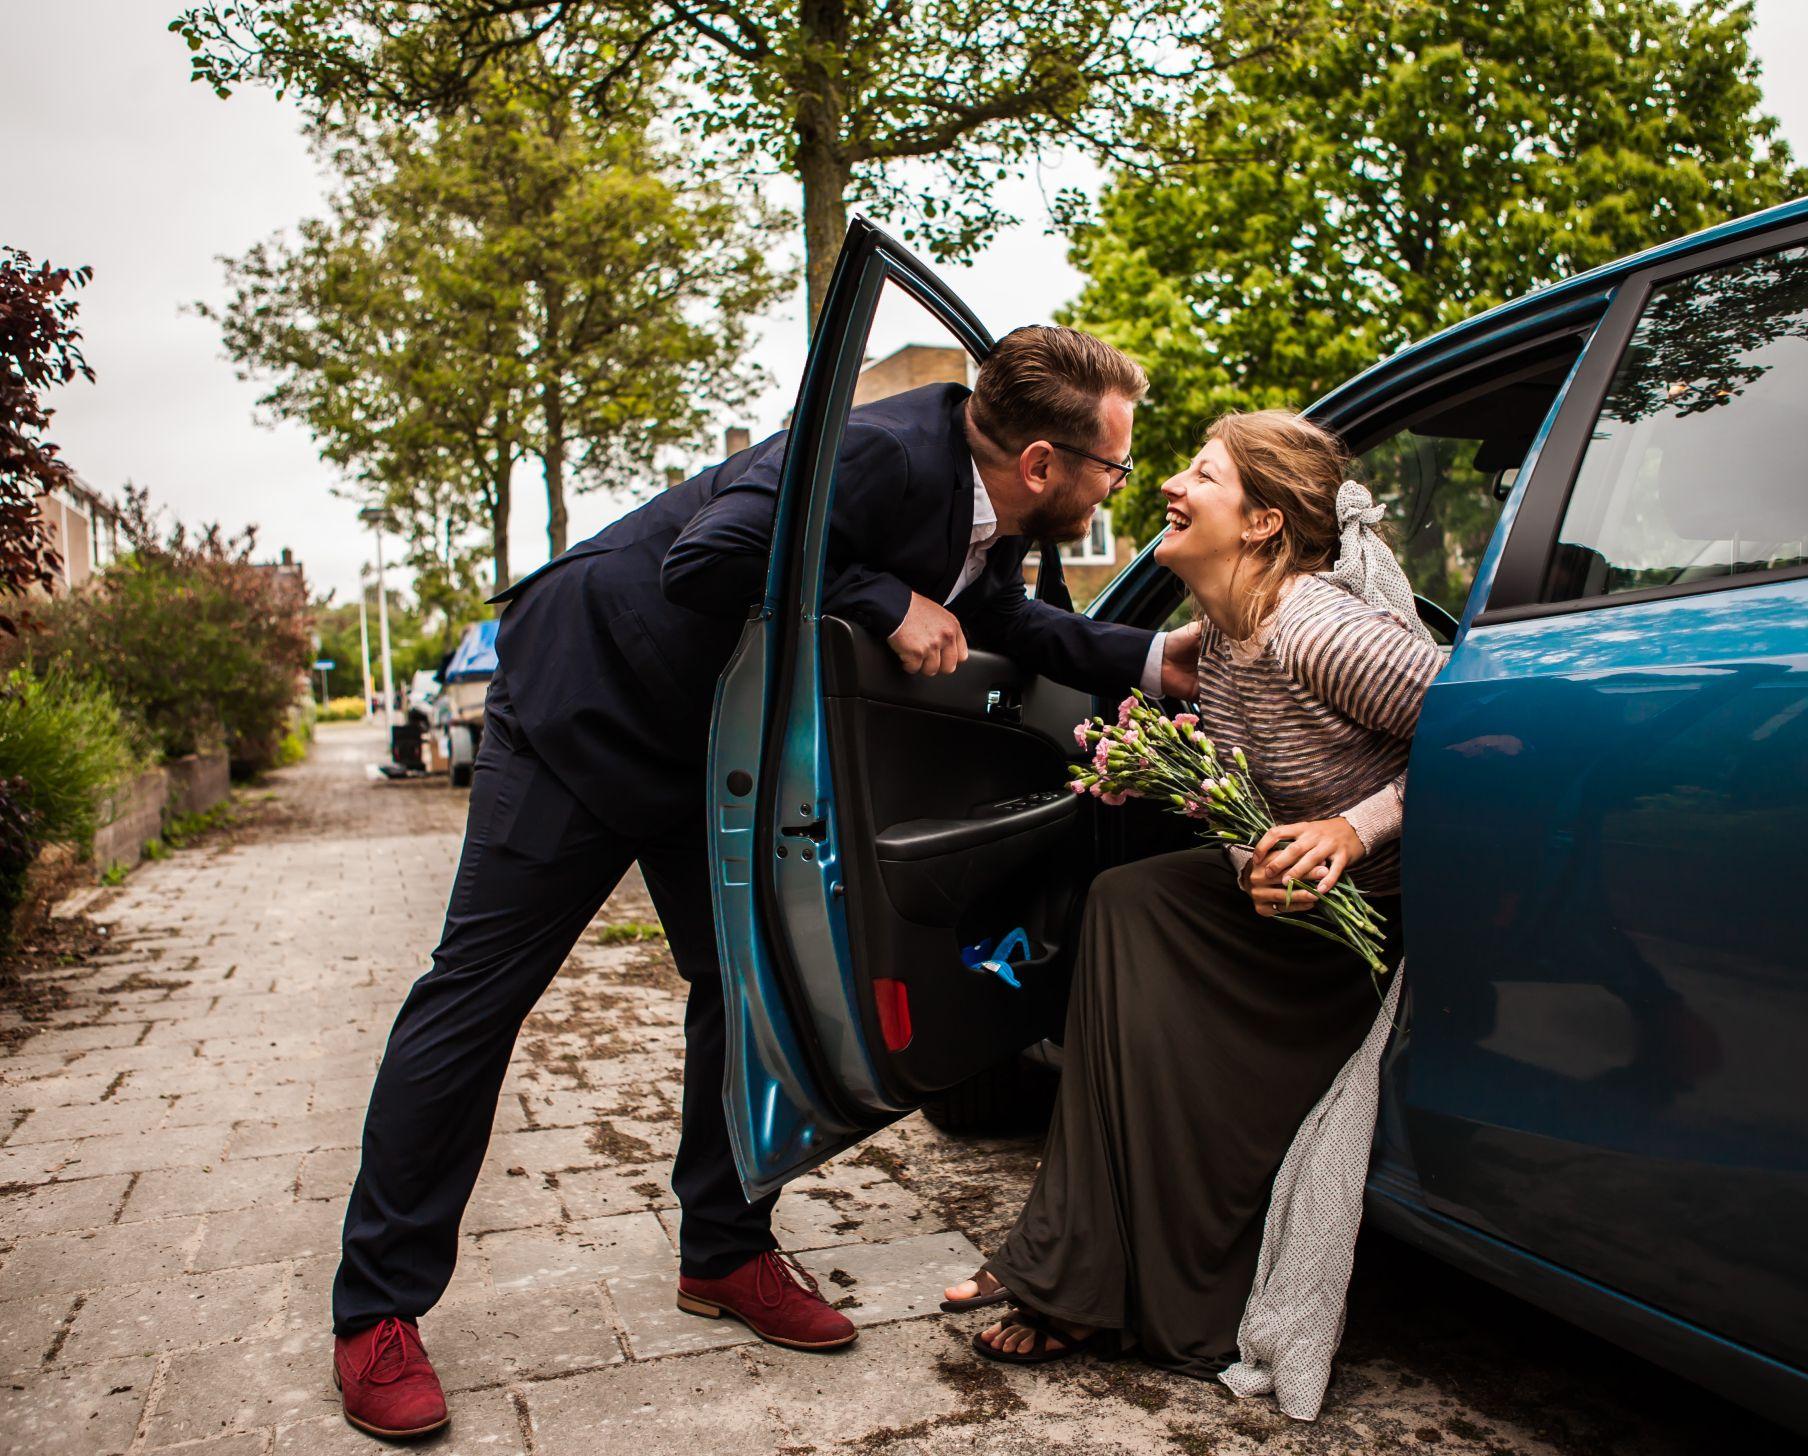 Tomwinters fotografie trouwen bij de auto